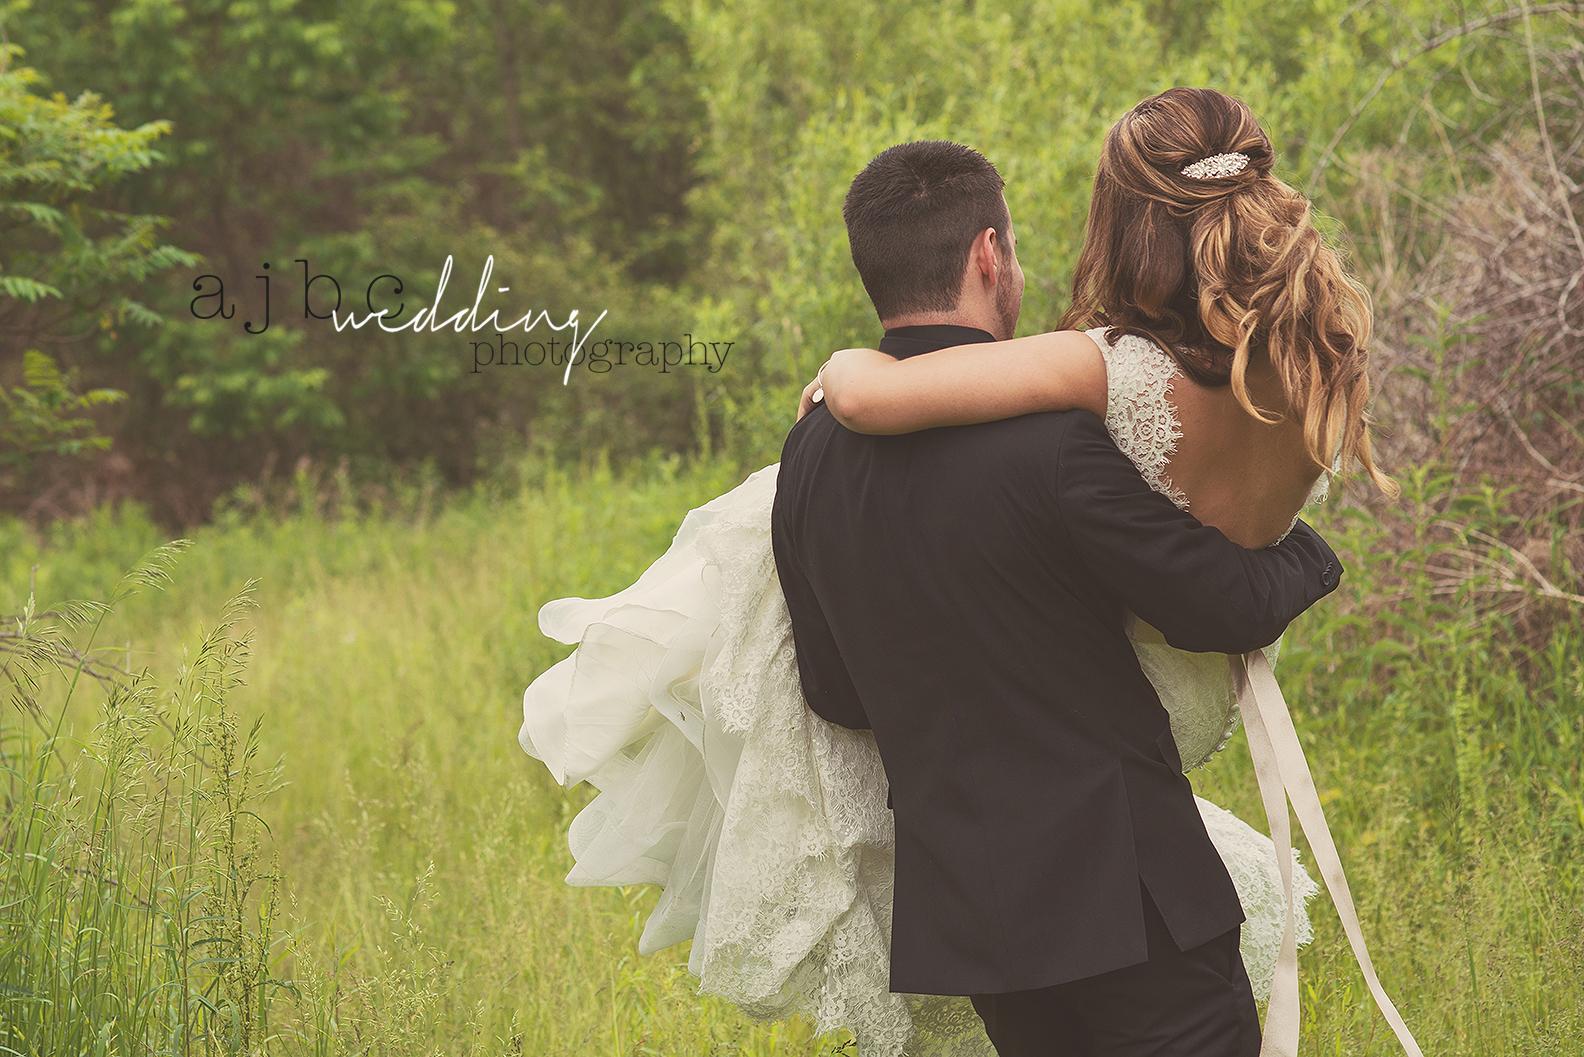 ajbcphotography-port-huron-michigan-wedding-photographer-outdoors-summer-wedding-country-wedding-wadhams-michigan-bride-vintage-wedding-outdoor-photographer.jpg